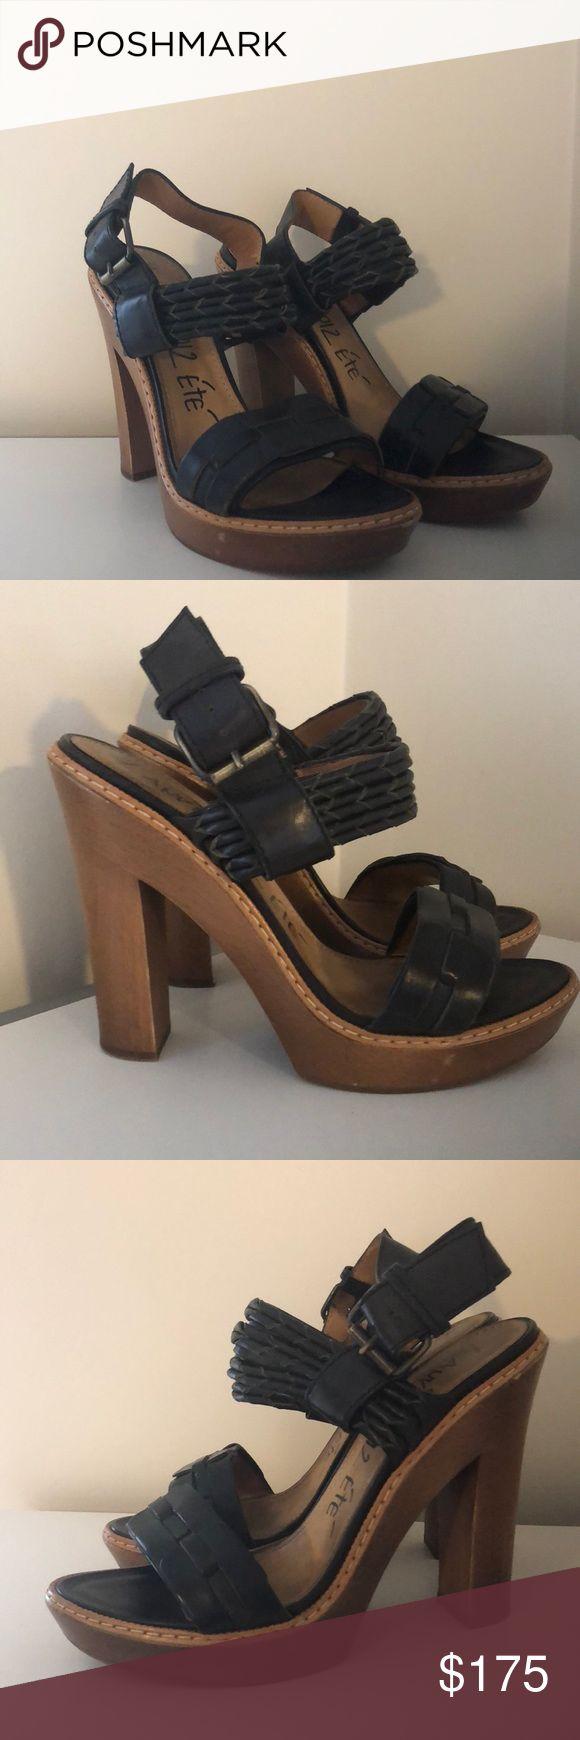 Lanvin Block Heel Sandals Black leather Lanvin sandals with block heel. Good condition. Size 38.5 or US 8.5. Lanvin Shoes Sandals